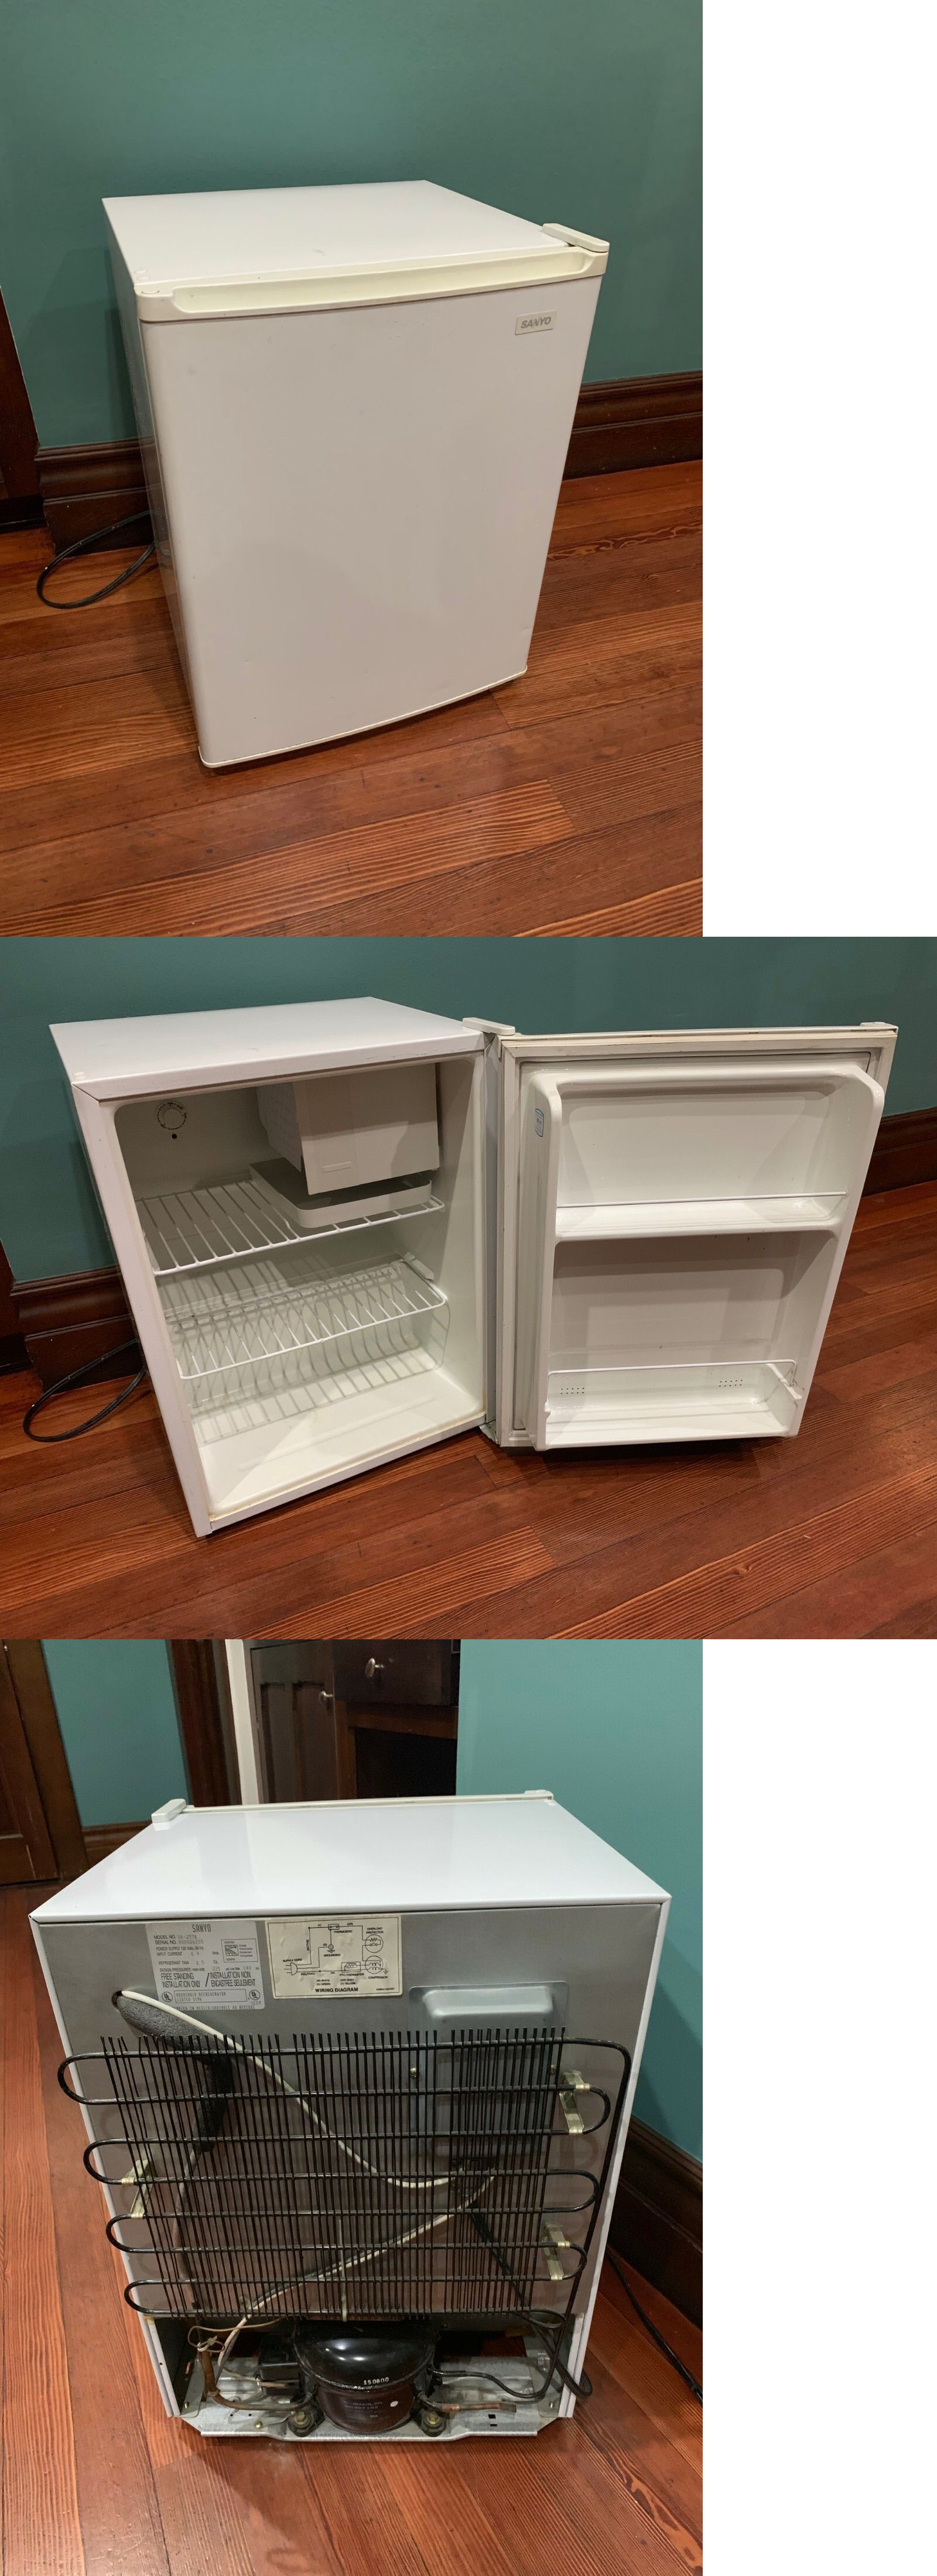 hight resolution of mini fridges 71262 brand new sanyo sr 257w mini fridge buy it now only 45 on ebay fridges brand sanyo fridge